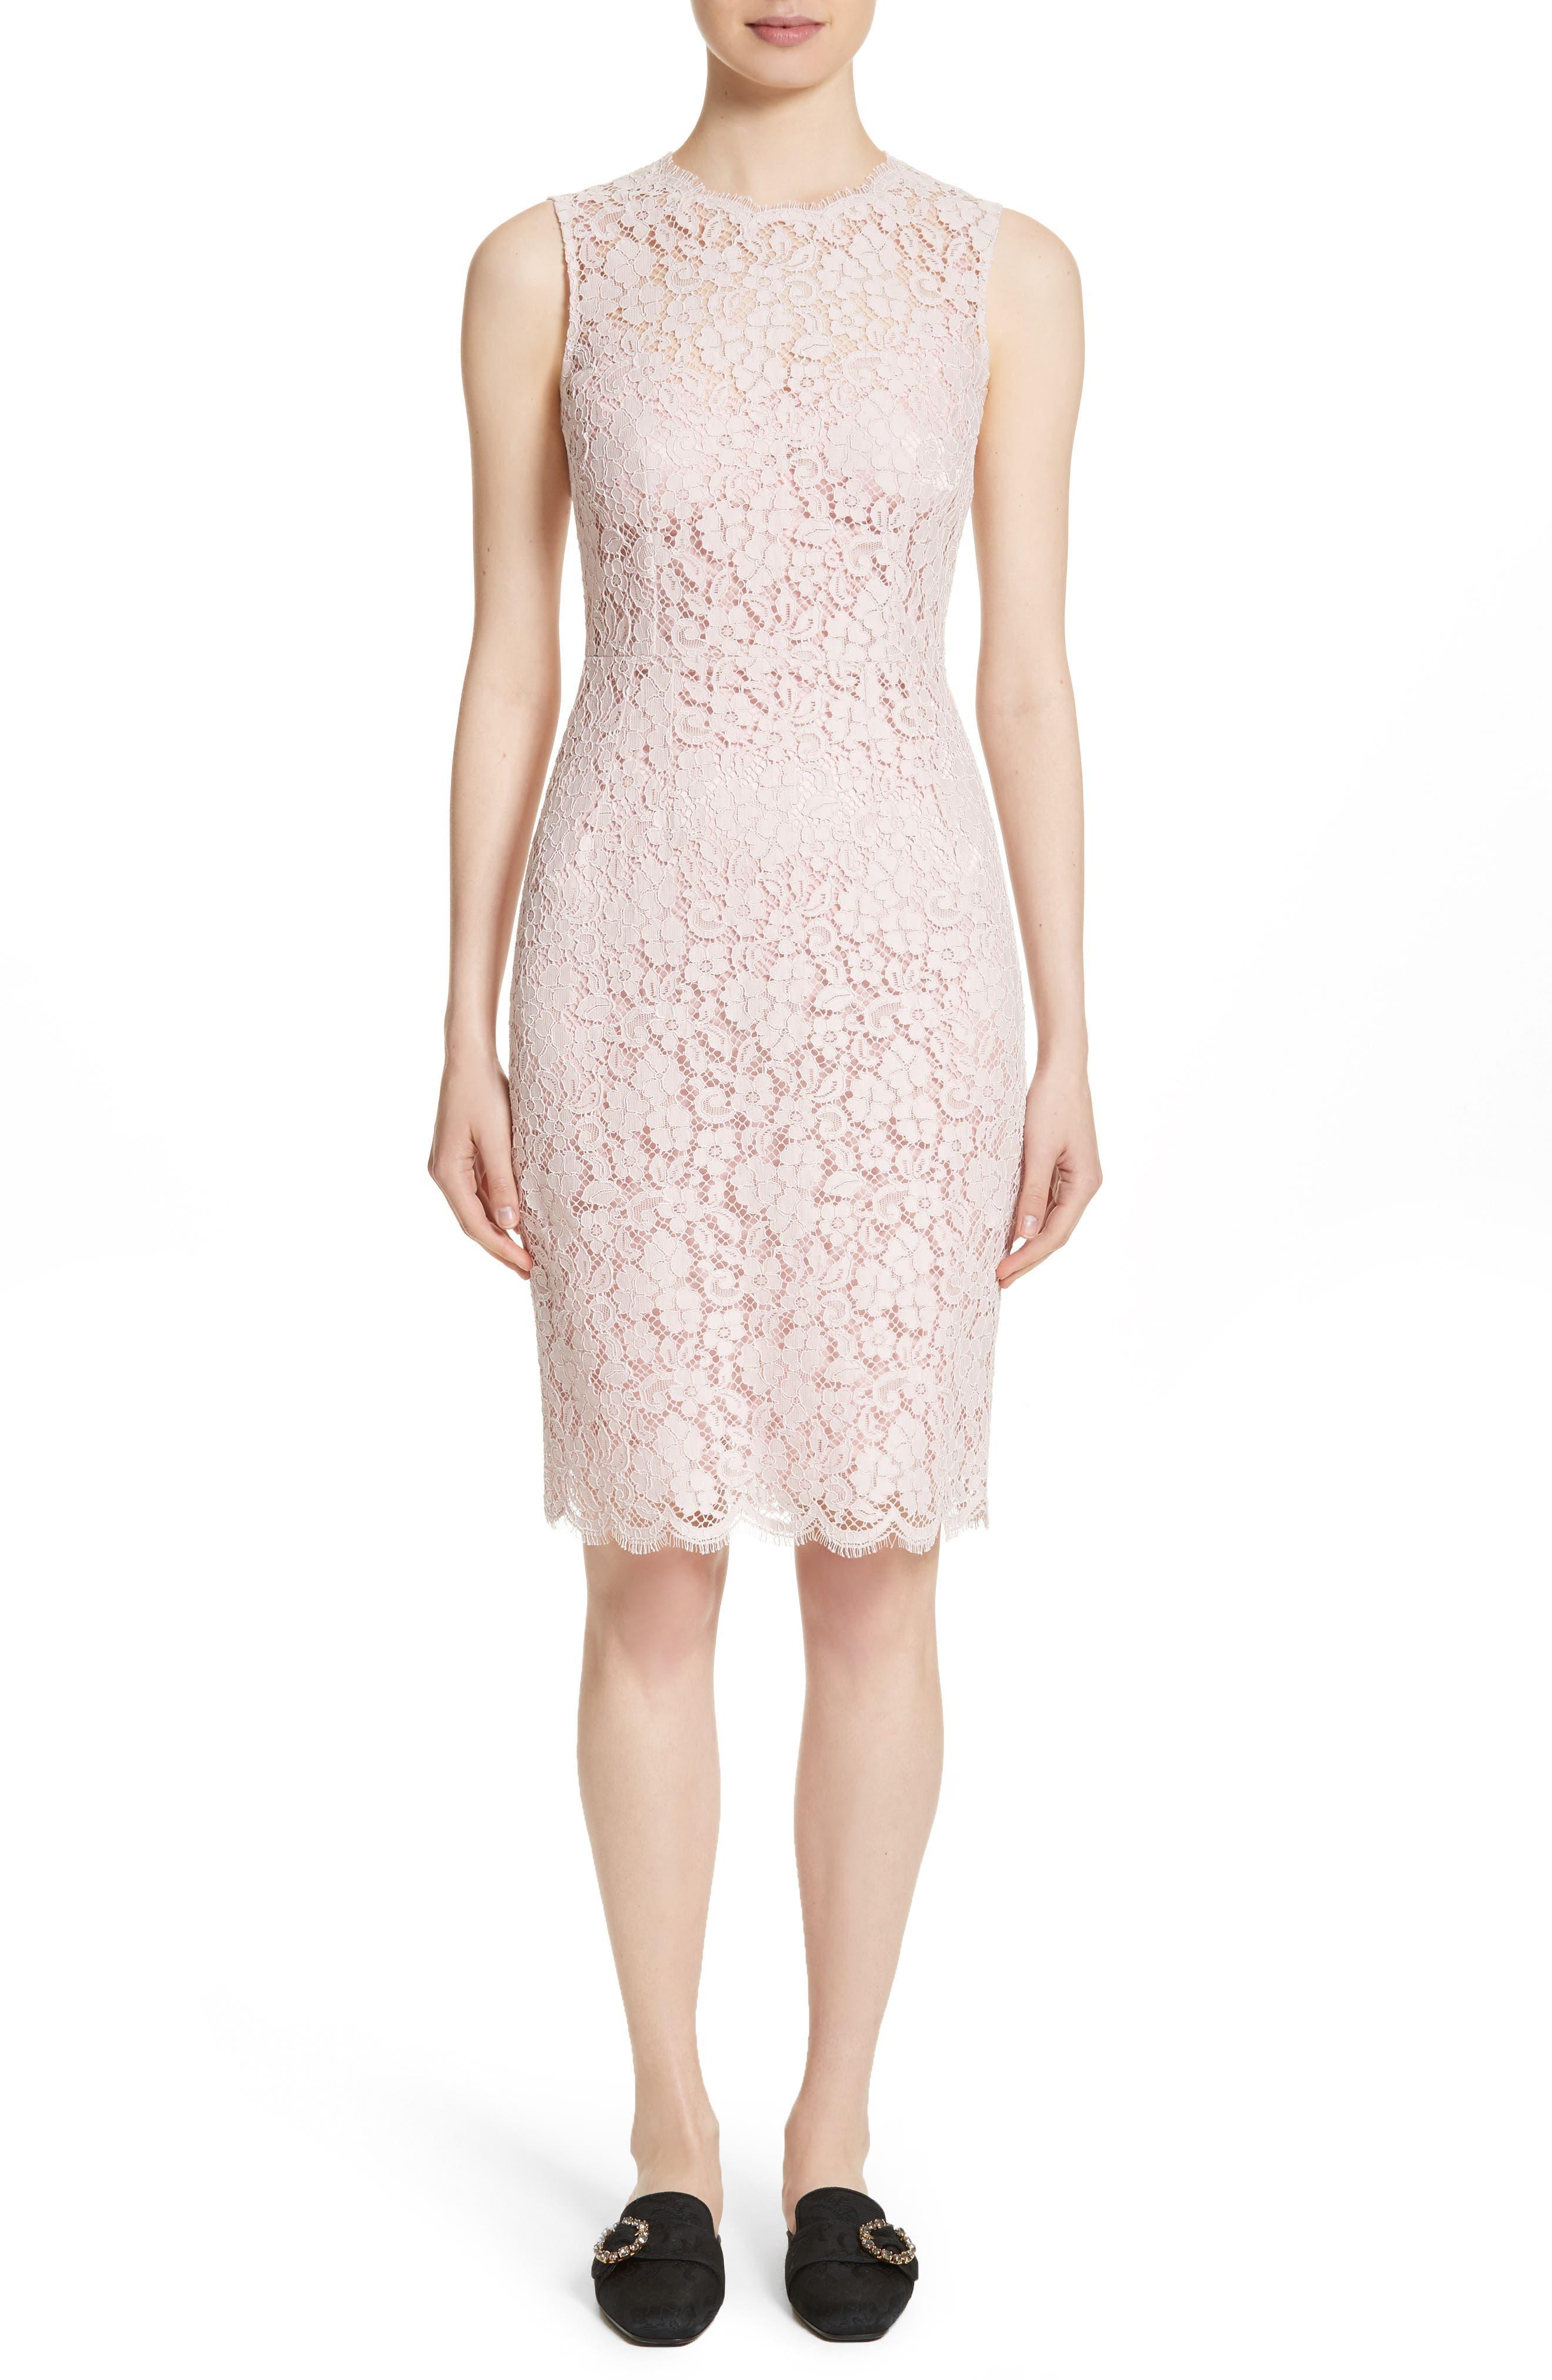 Alternate Image 1 Selected - Dolce&Gabbana Lace Sheath Dress